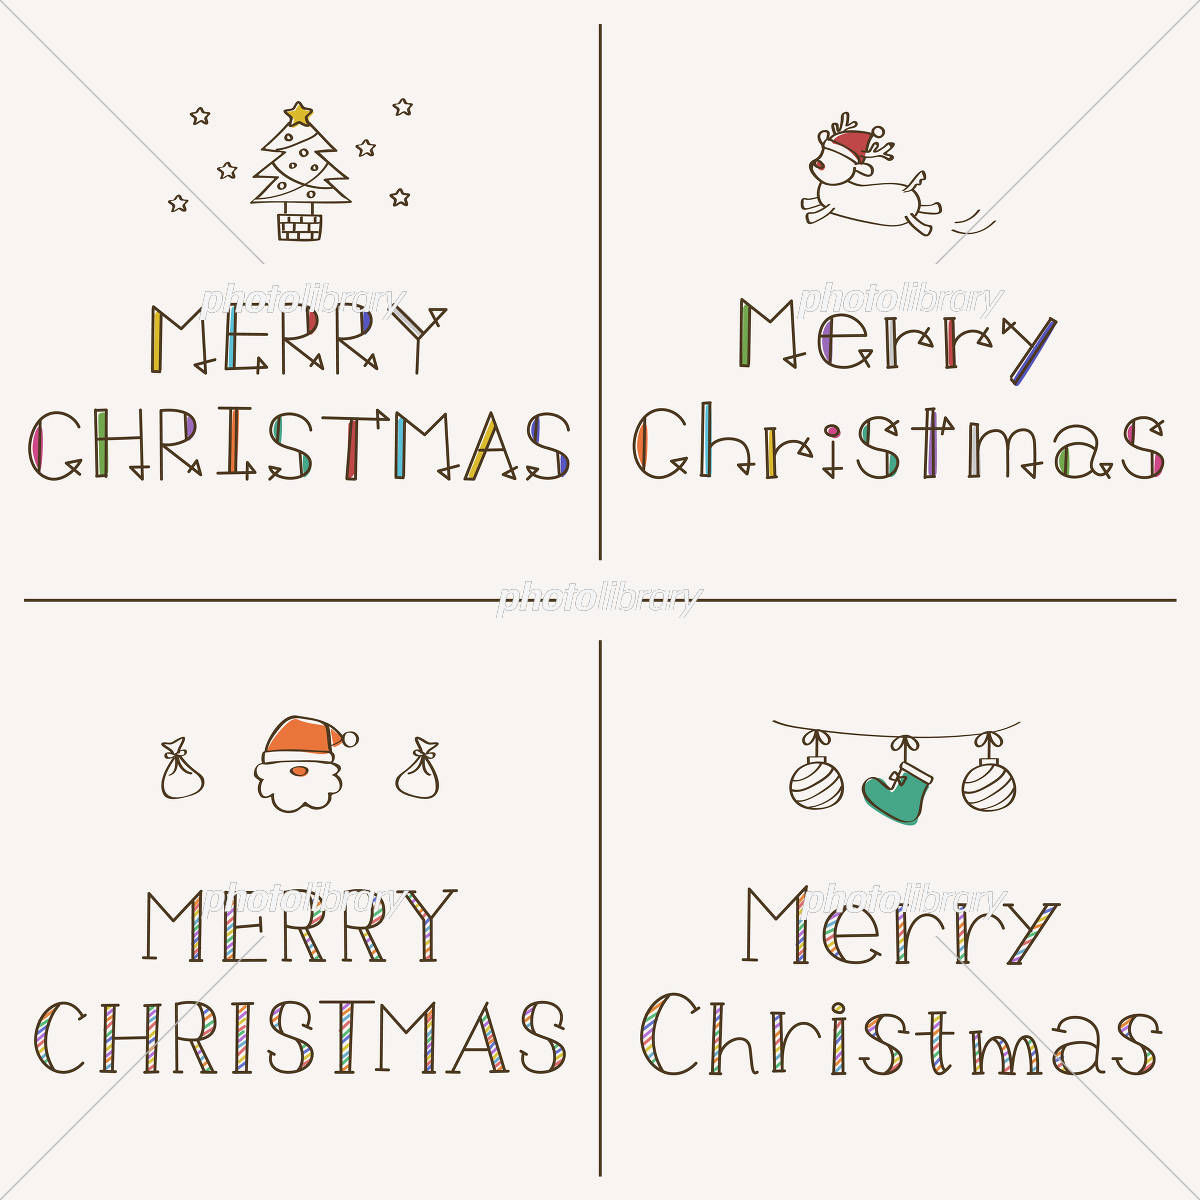 Merry Christmas 手書きフォント イラスト素材 [ 5581004